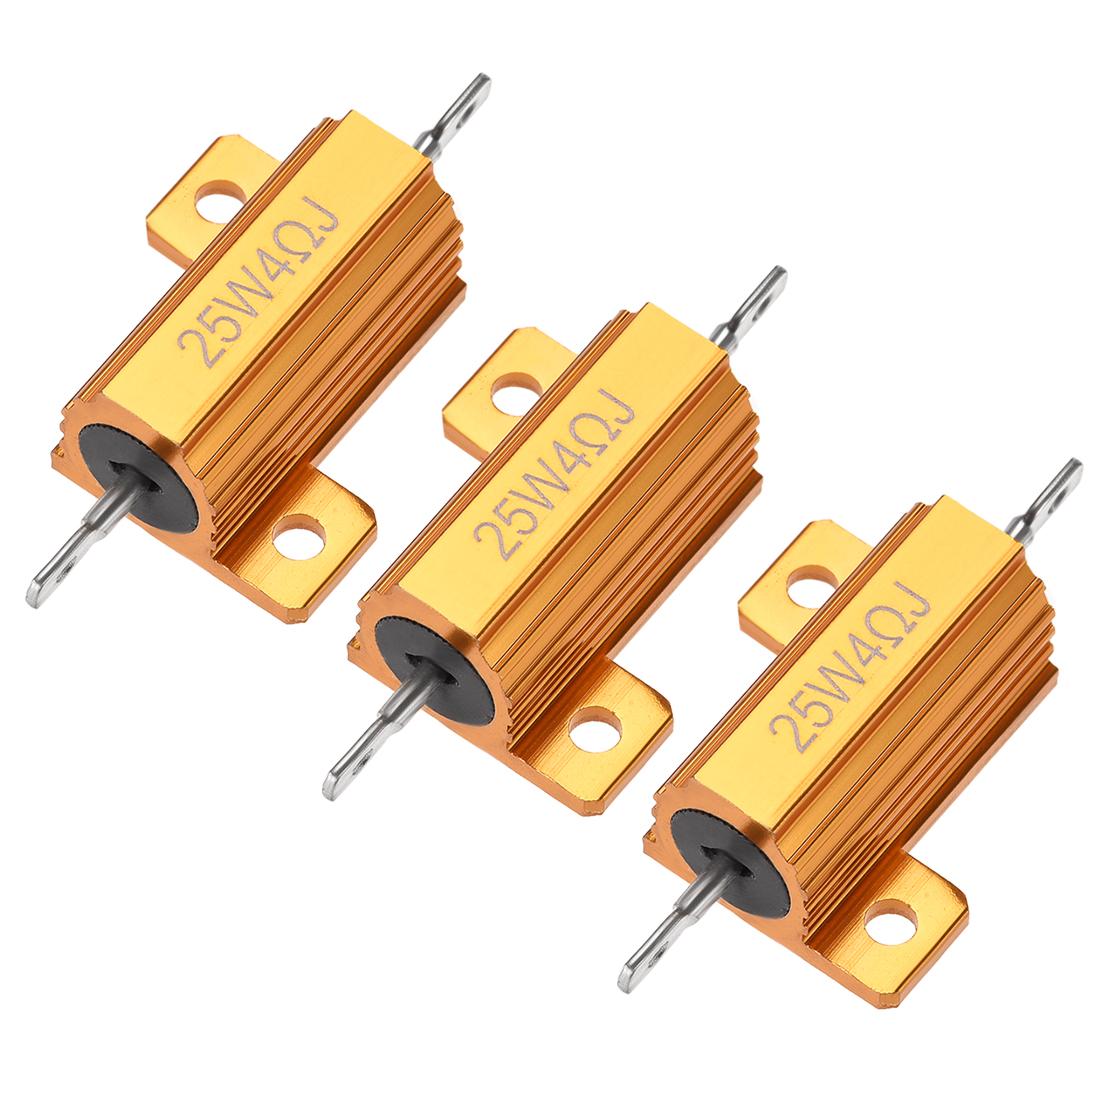 25W 4 Ohm 5% Aluminum Housing Resistor Wirewound Resistor Gold Tone 3 Pcs